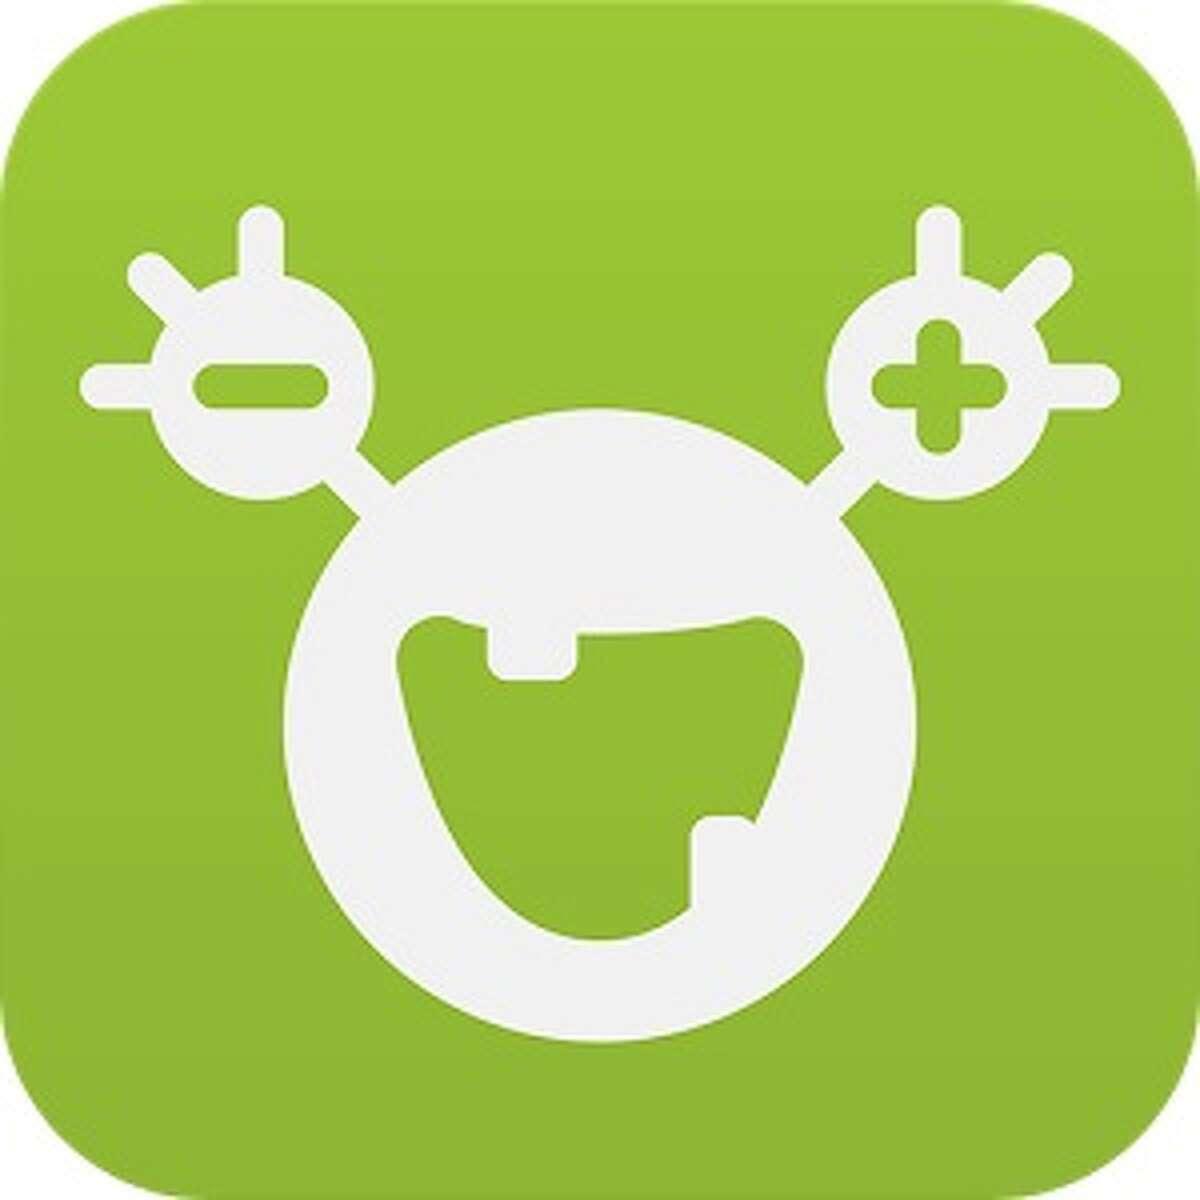 Mysugr app by Diabetes Companion